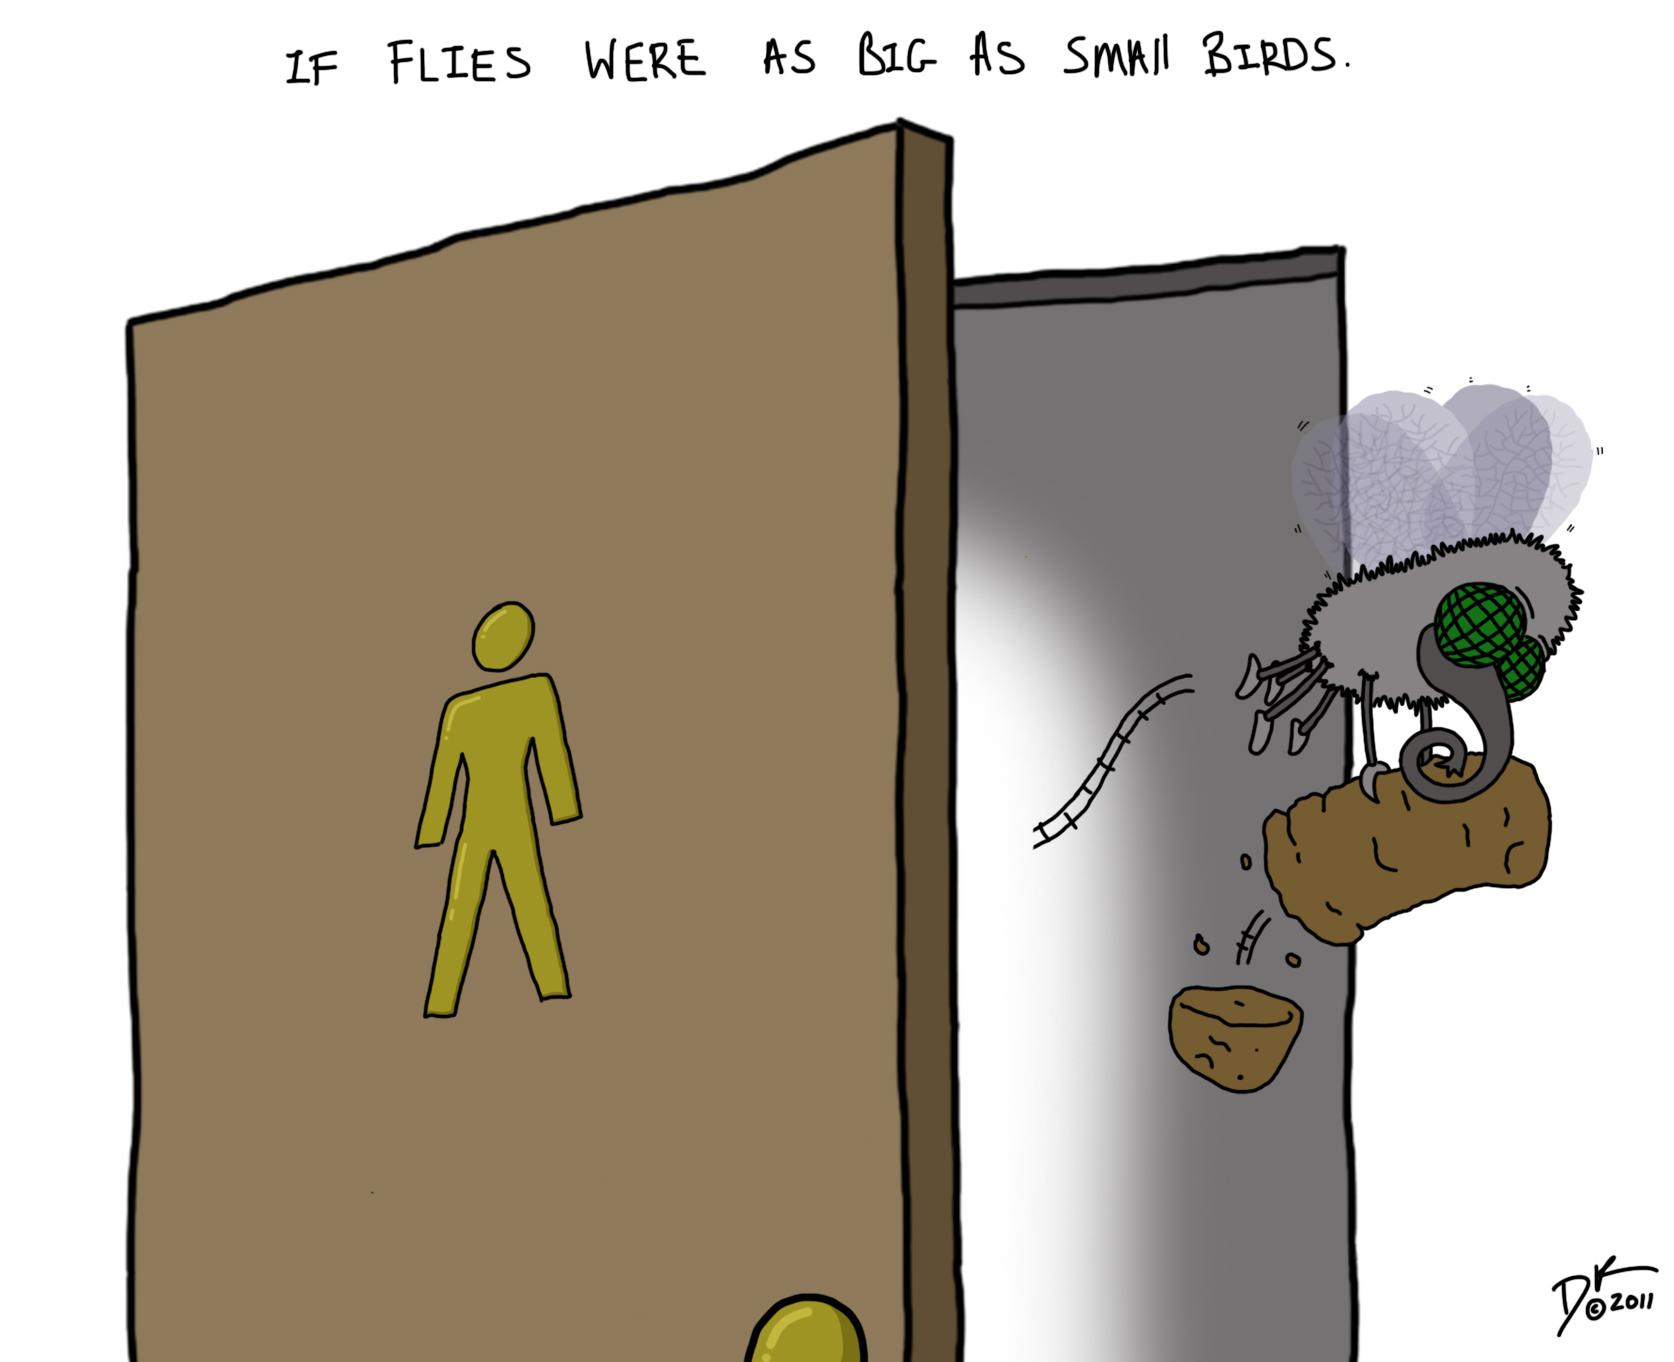 Bird Fly